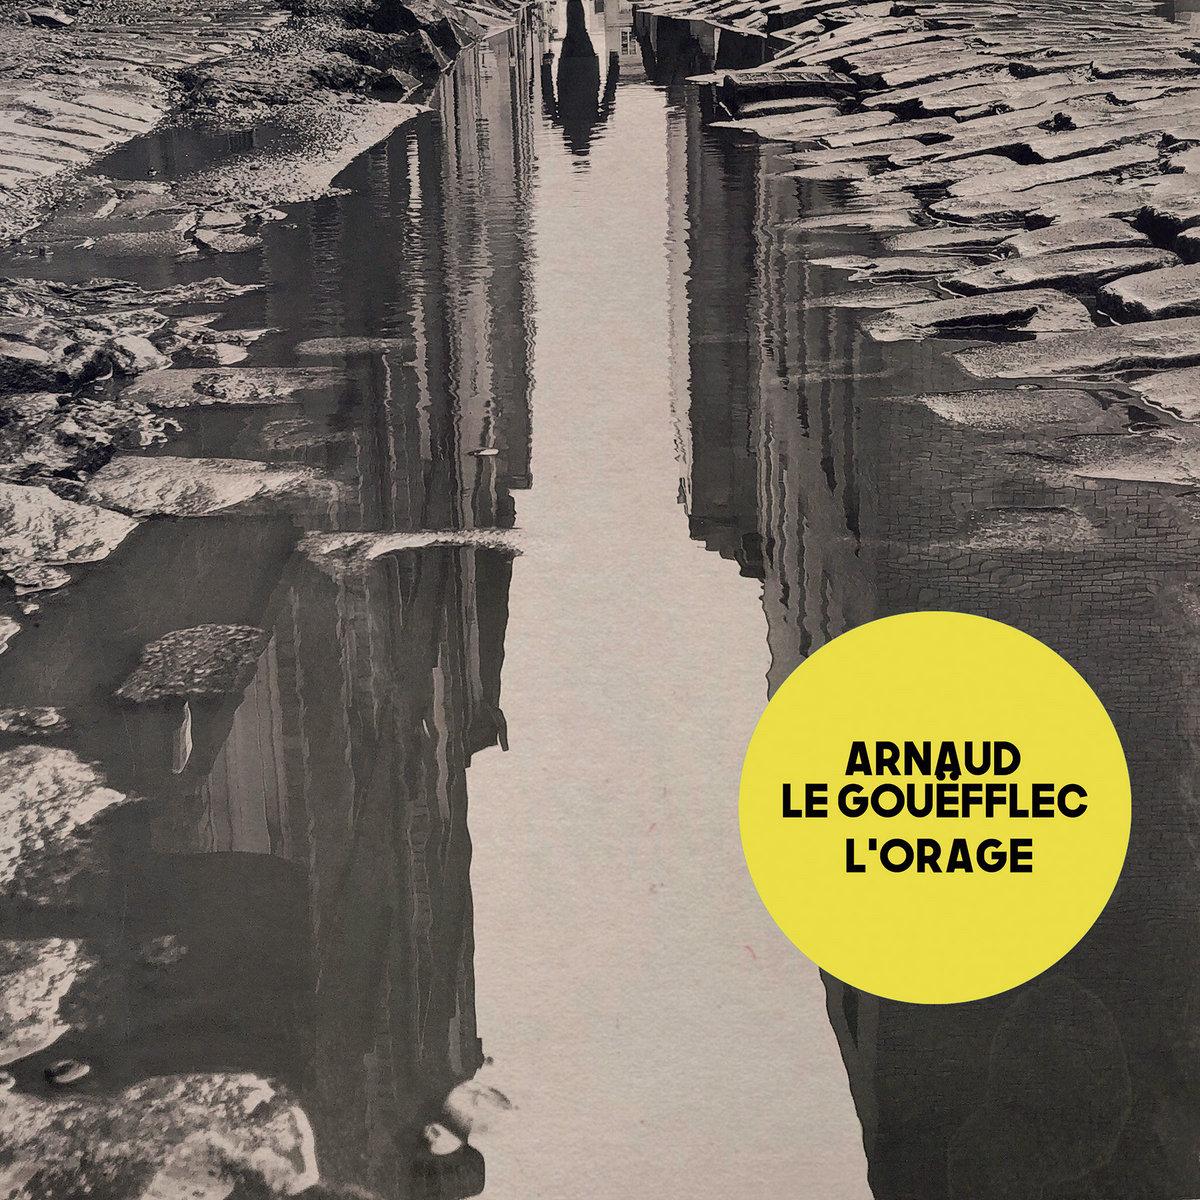 Arnaud Le Gouëfflec – L'orage